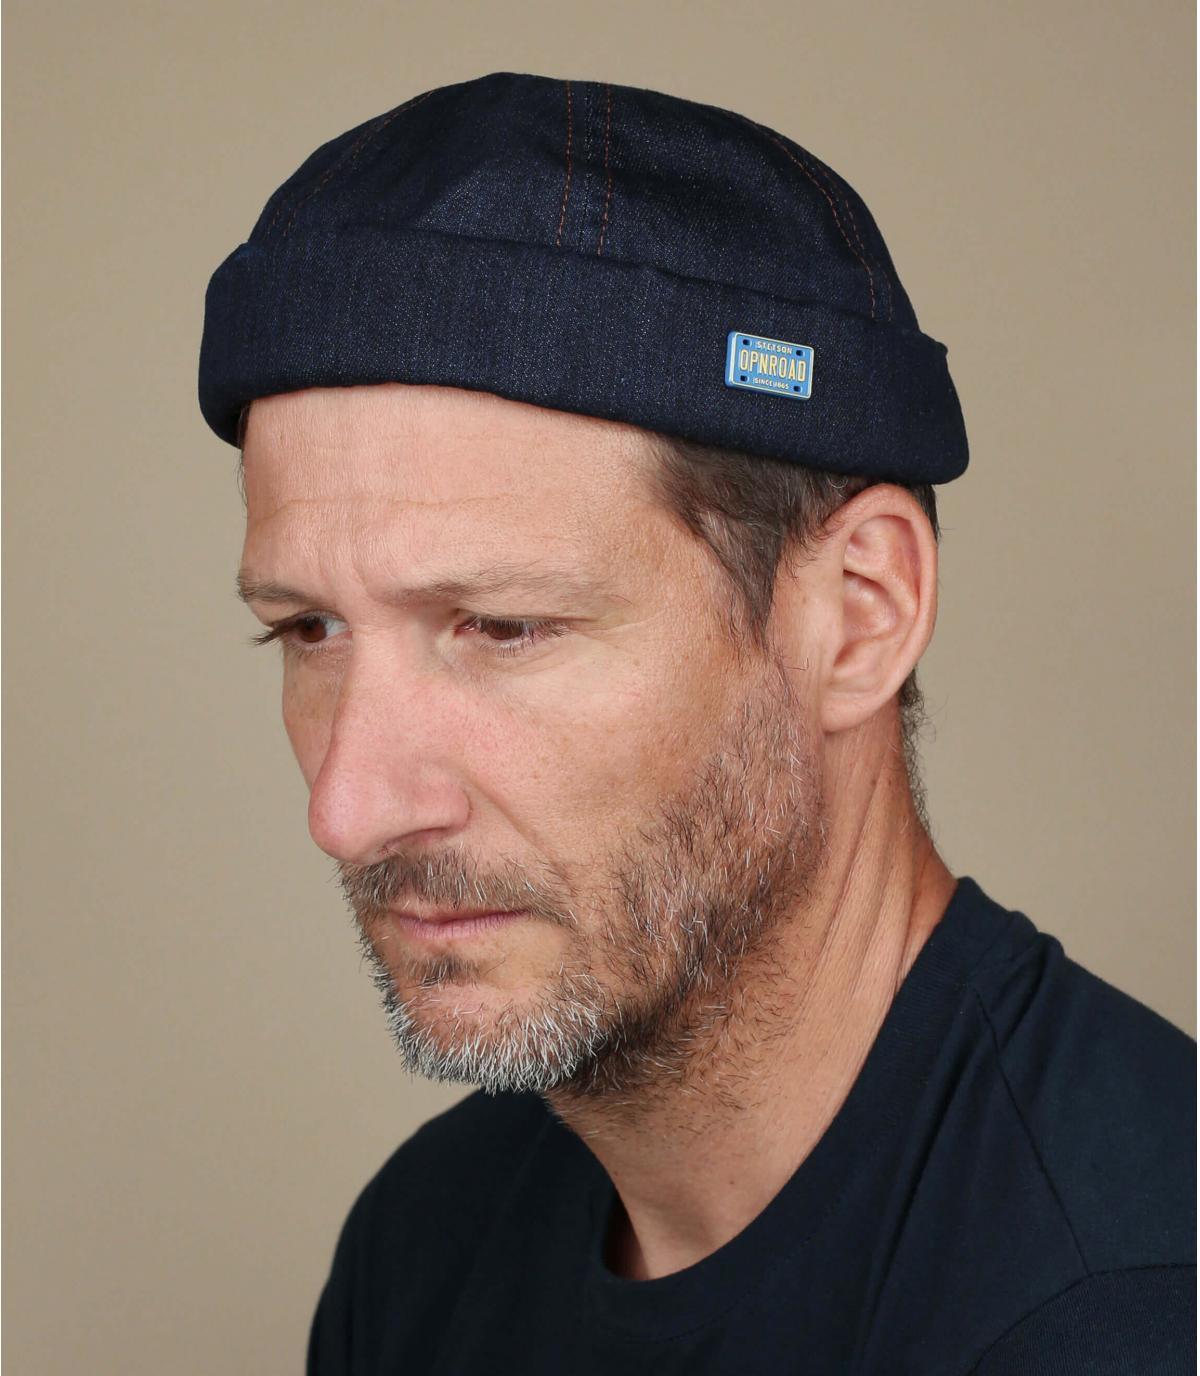 Denim hoed van Stetson